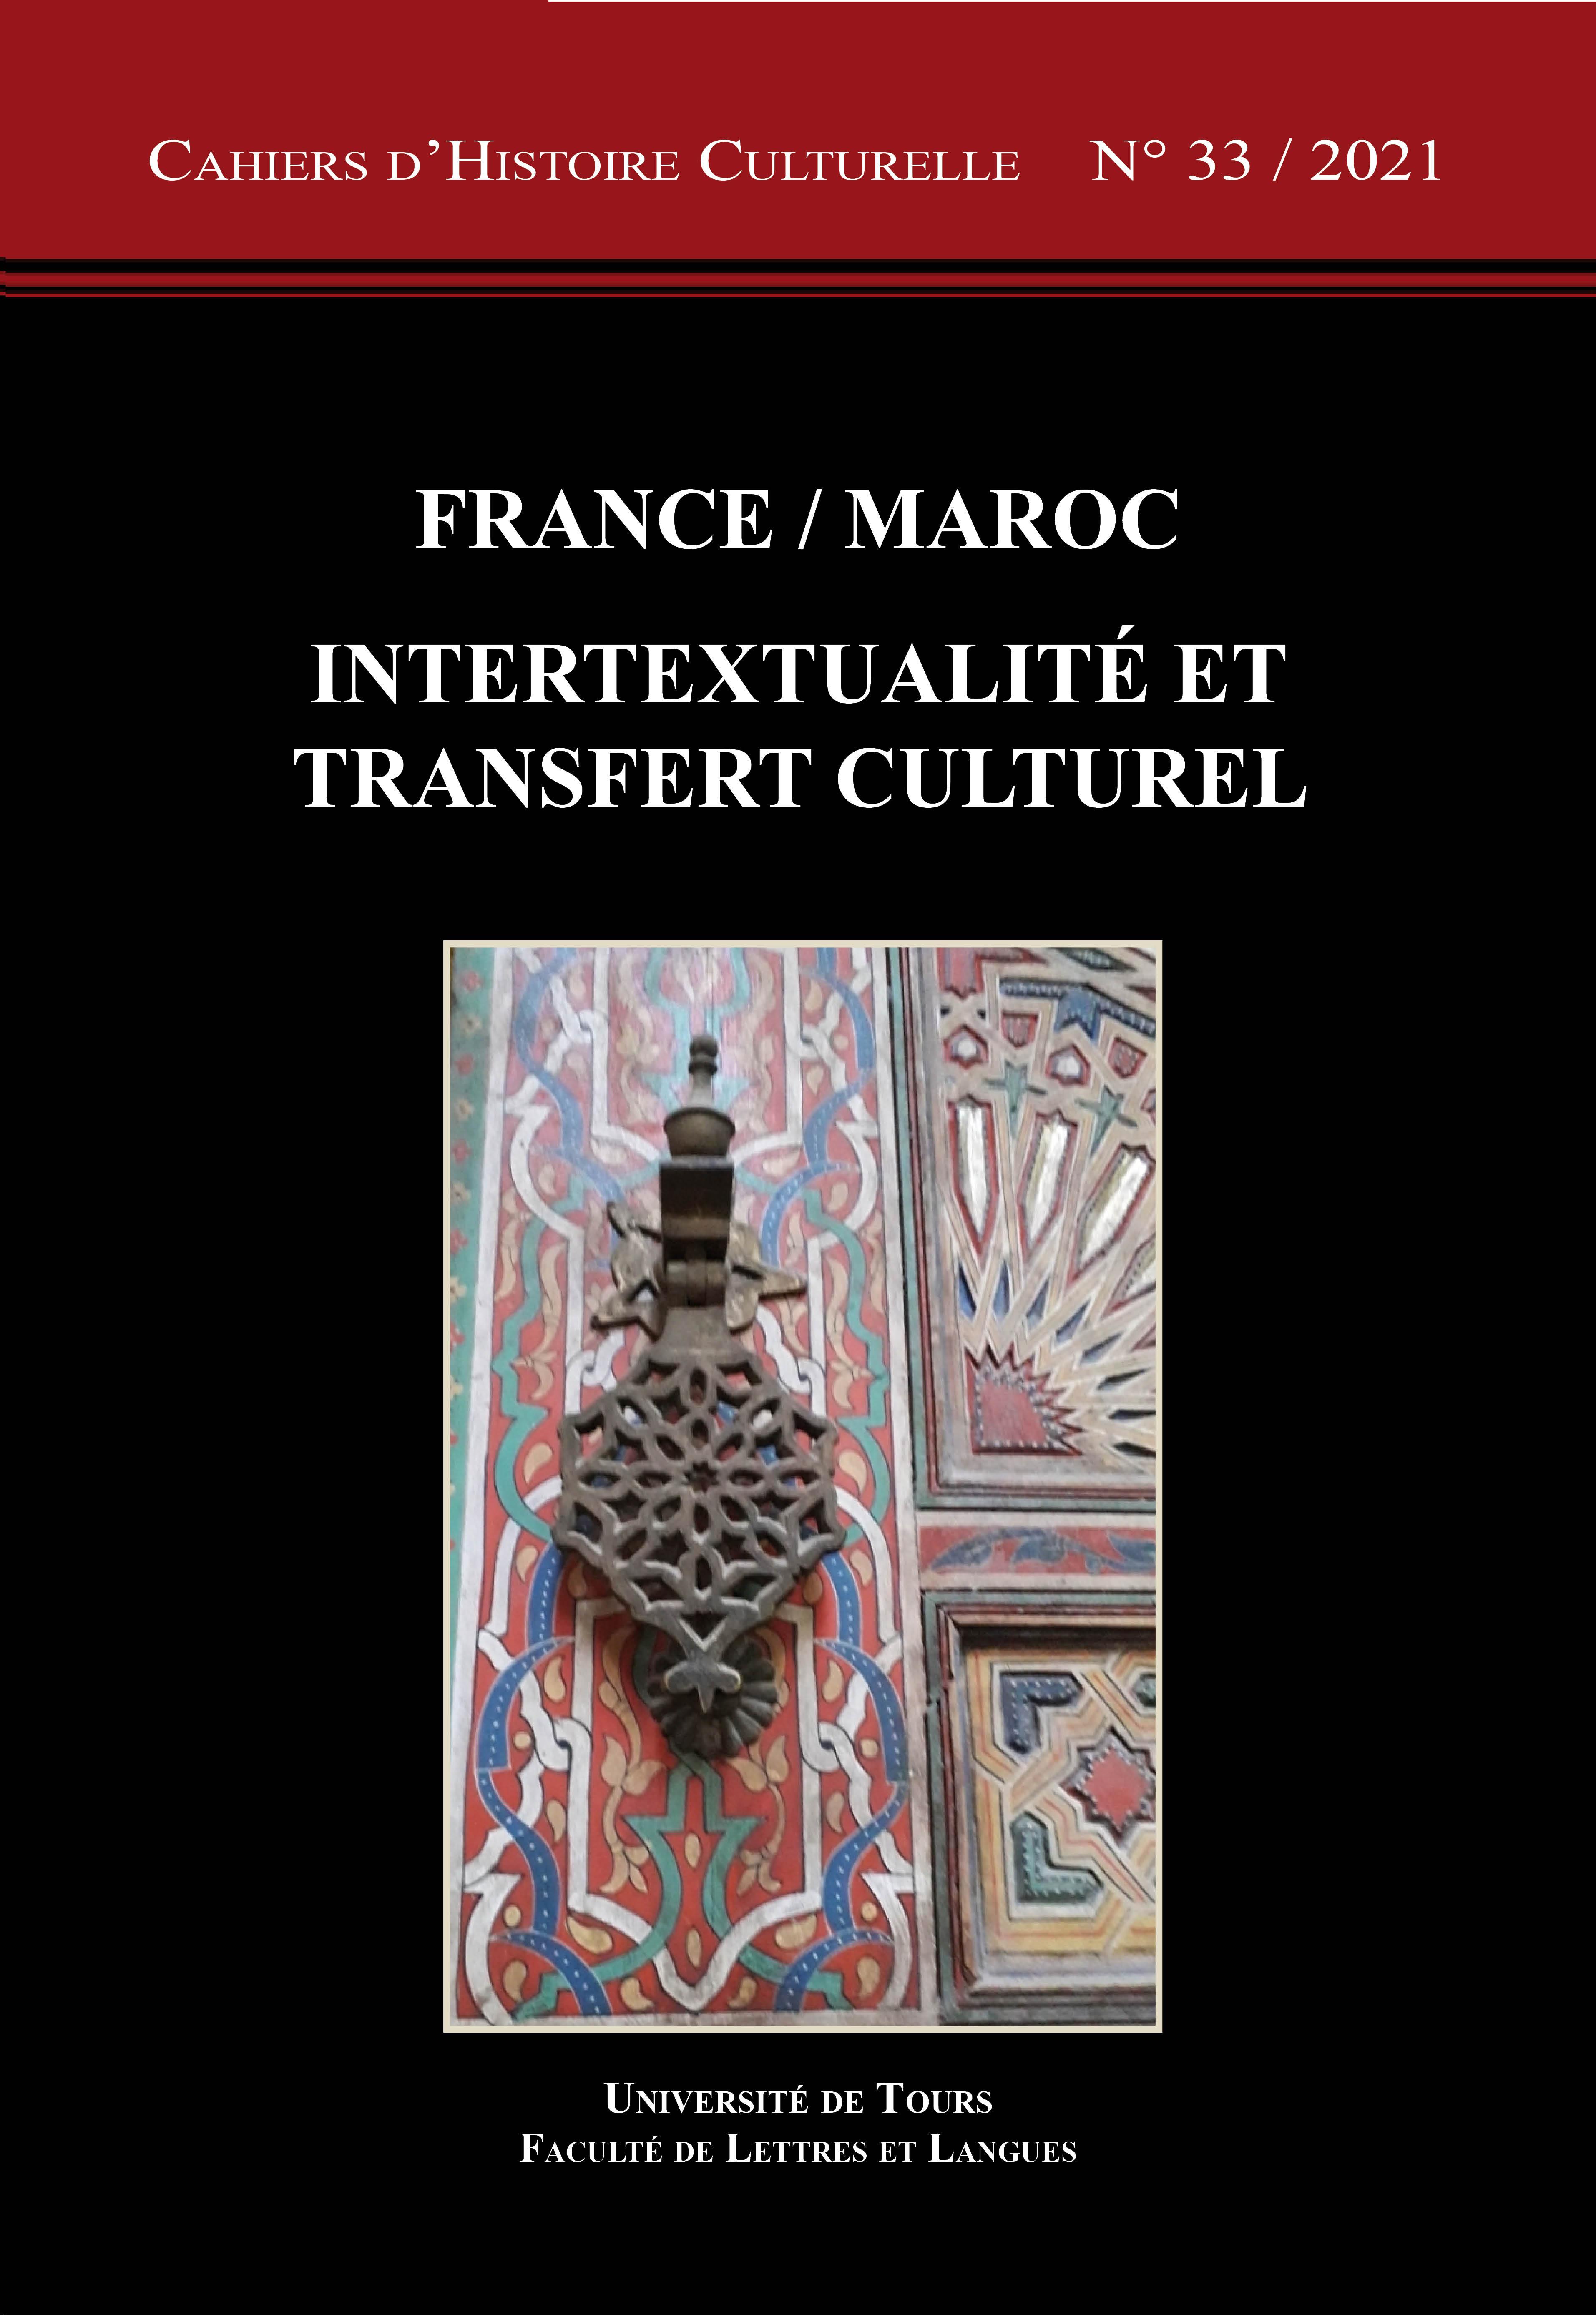 Couv CHC 33 France Maroc